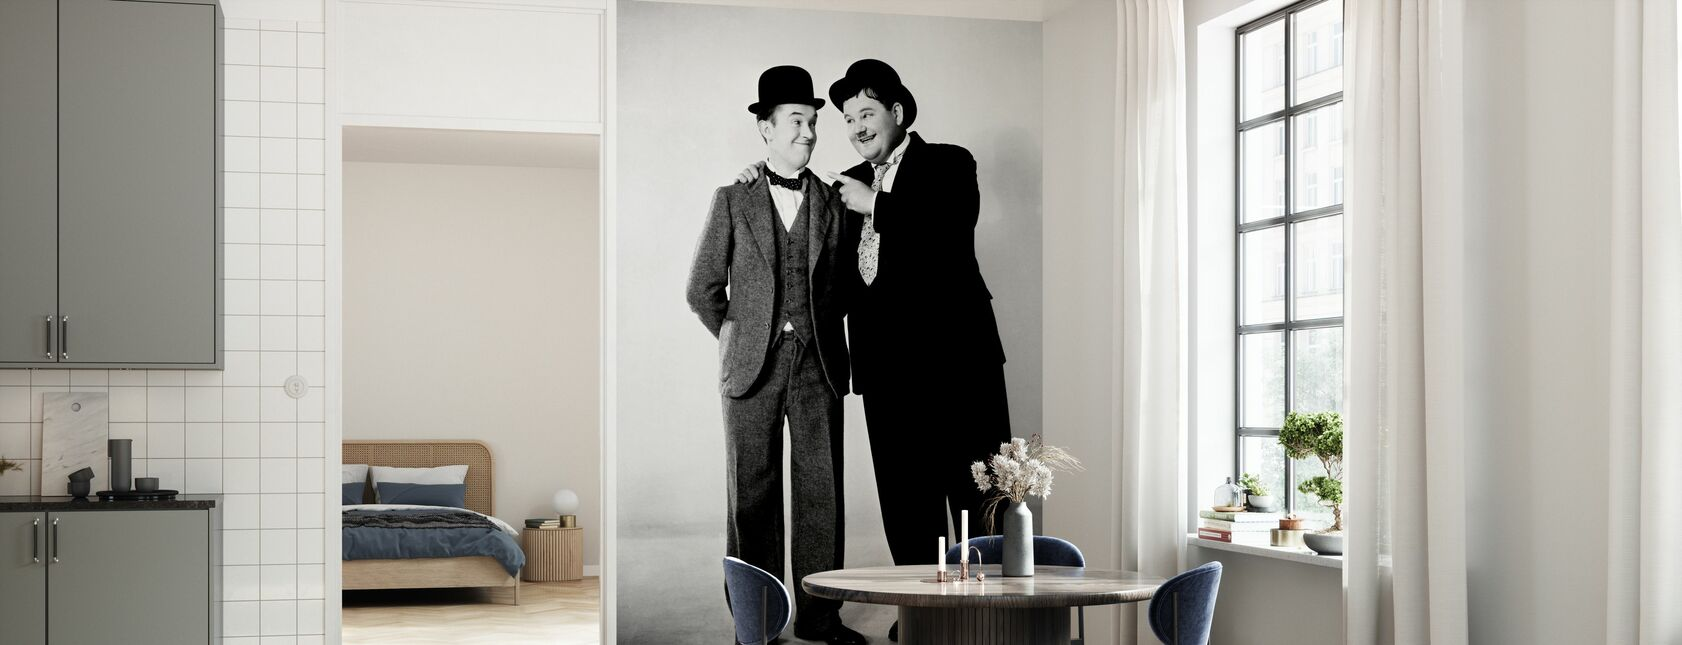 Oliver Hardy and Stan Laurel - Wallpaper - Kitchen